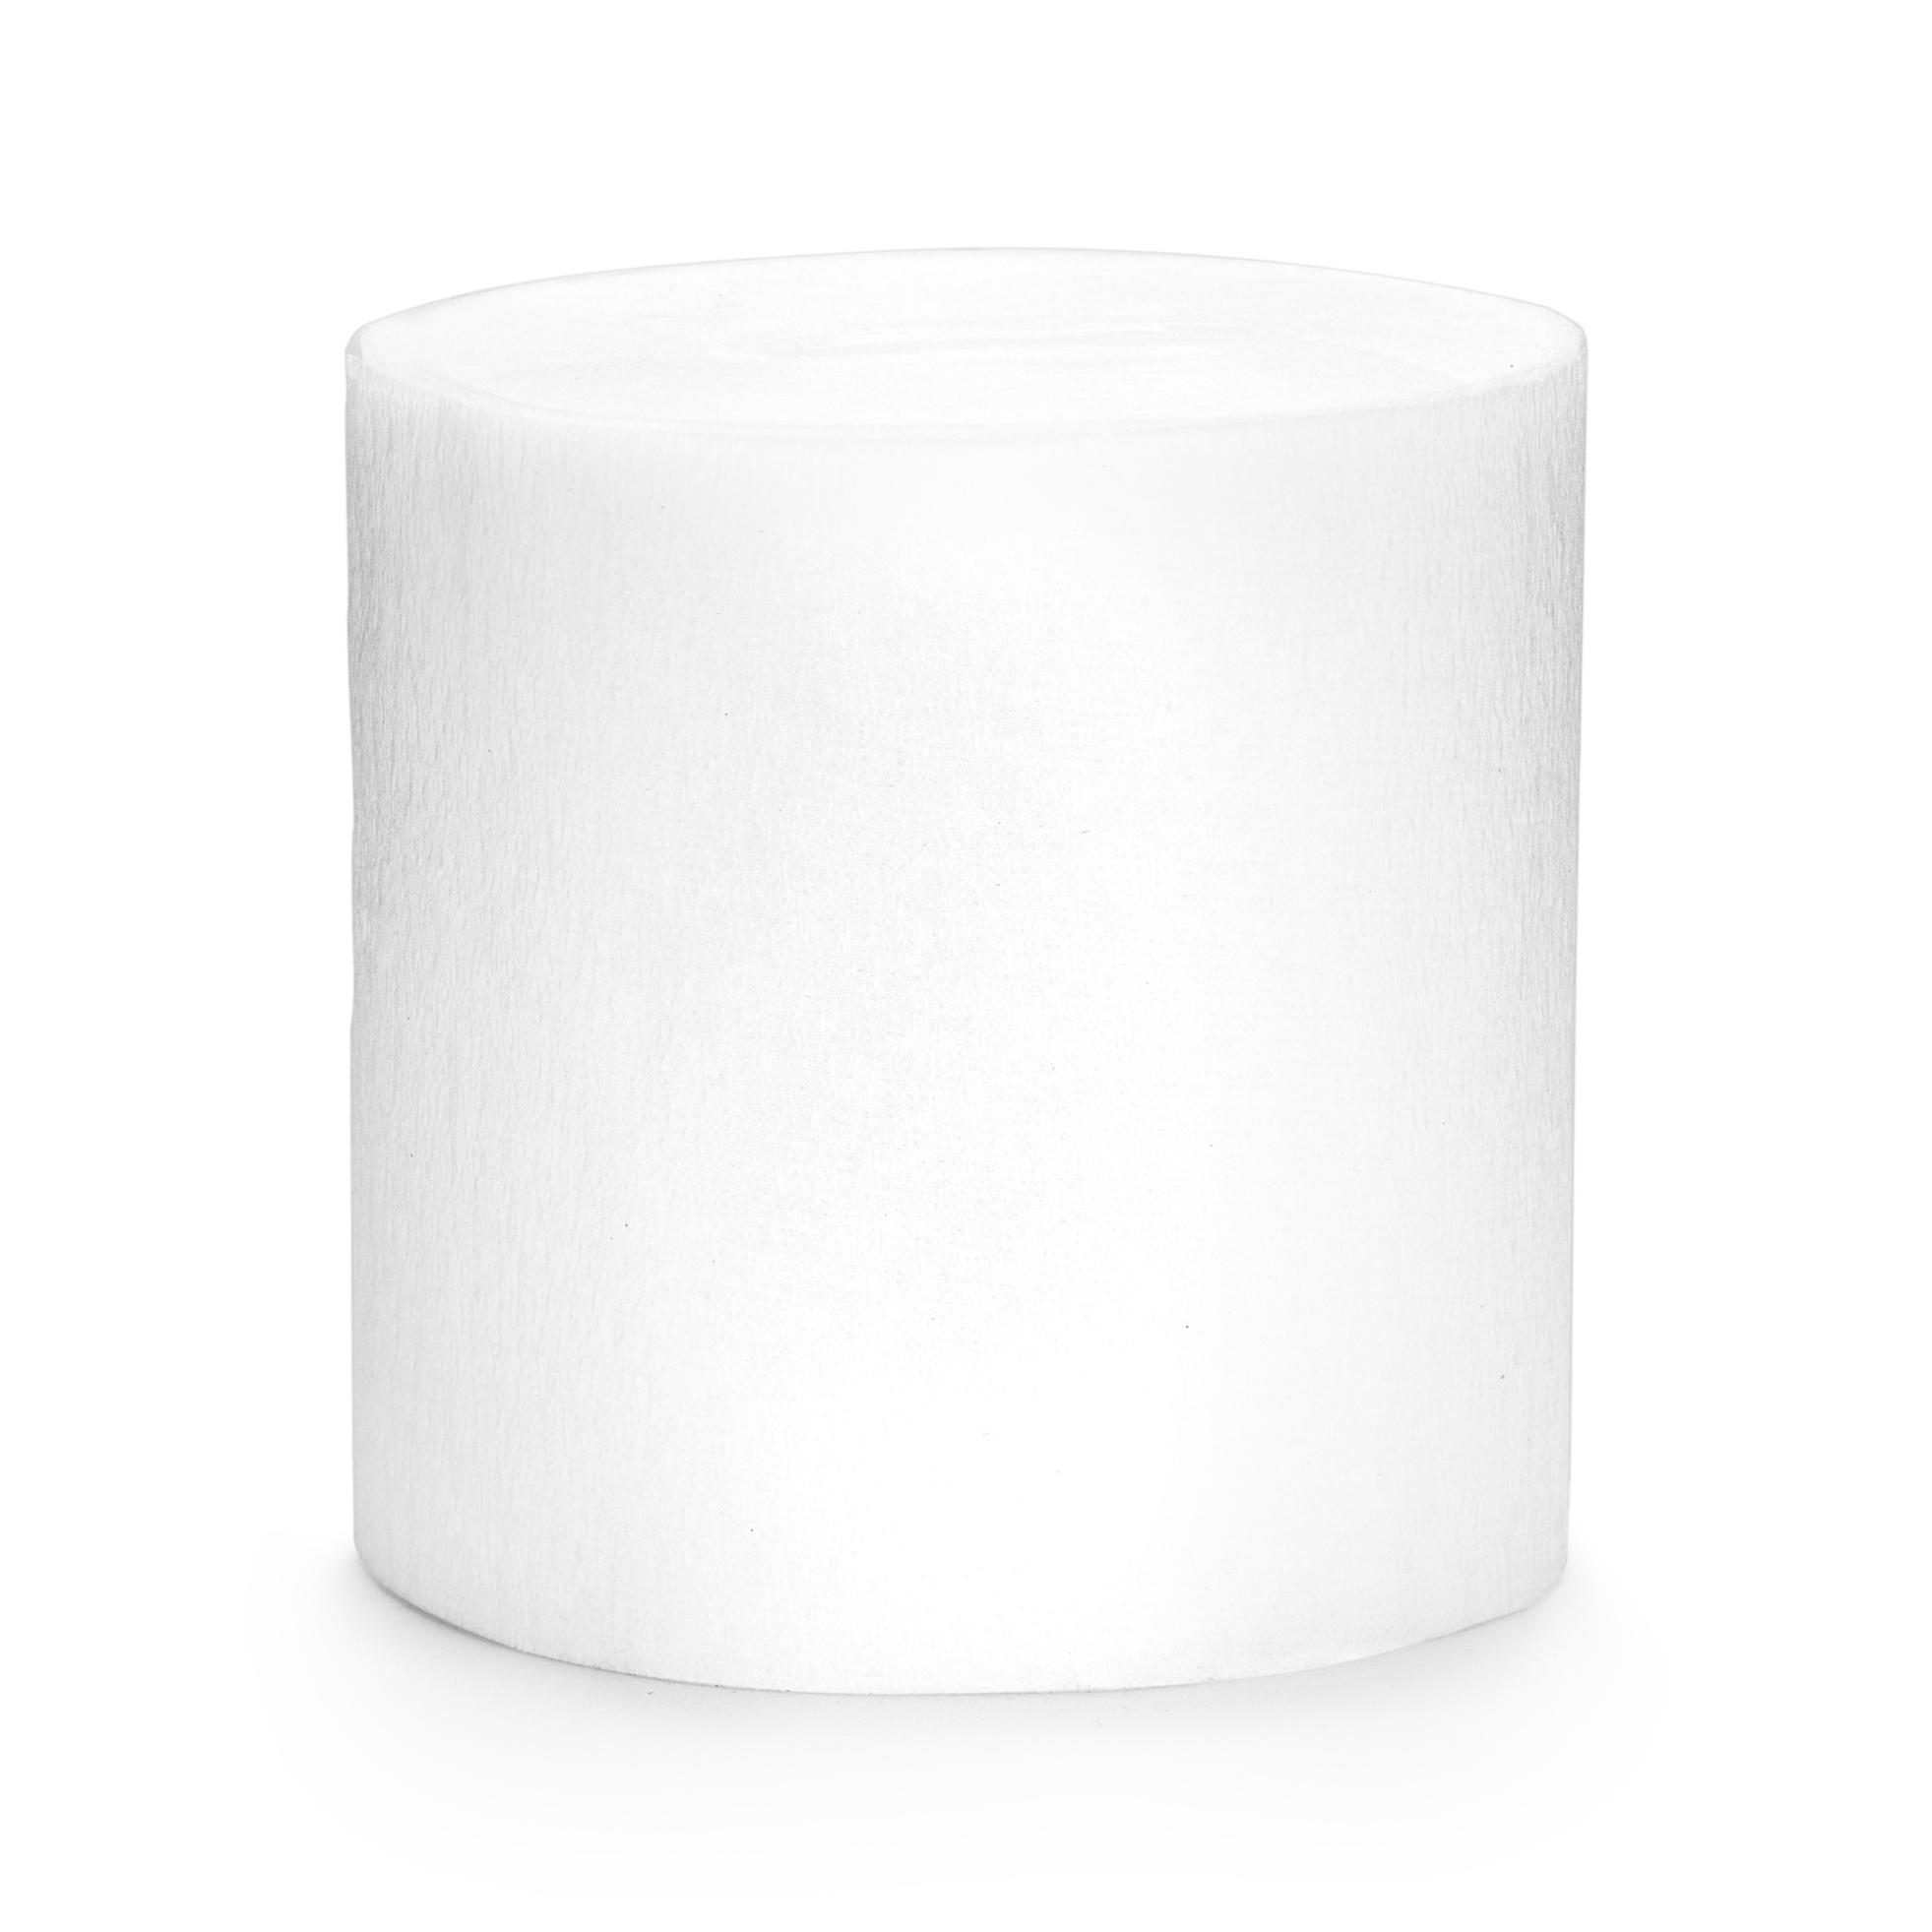 Krepáková stuha na dekoraci bílá 5 cm, návin 10 m, 4 ks